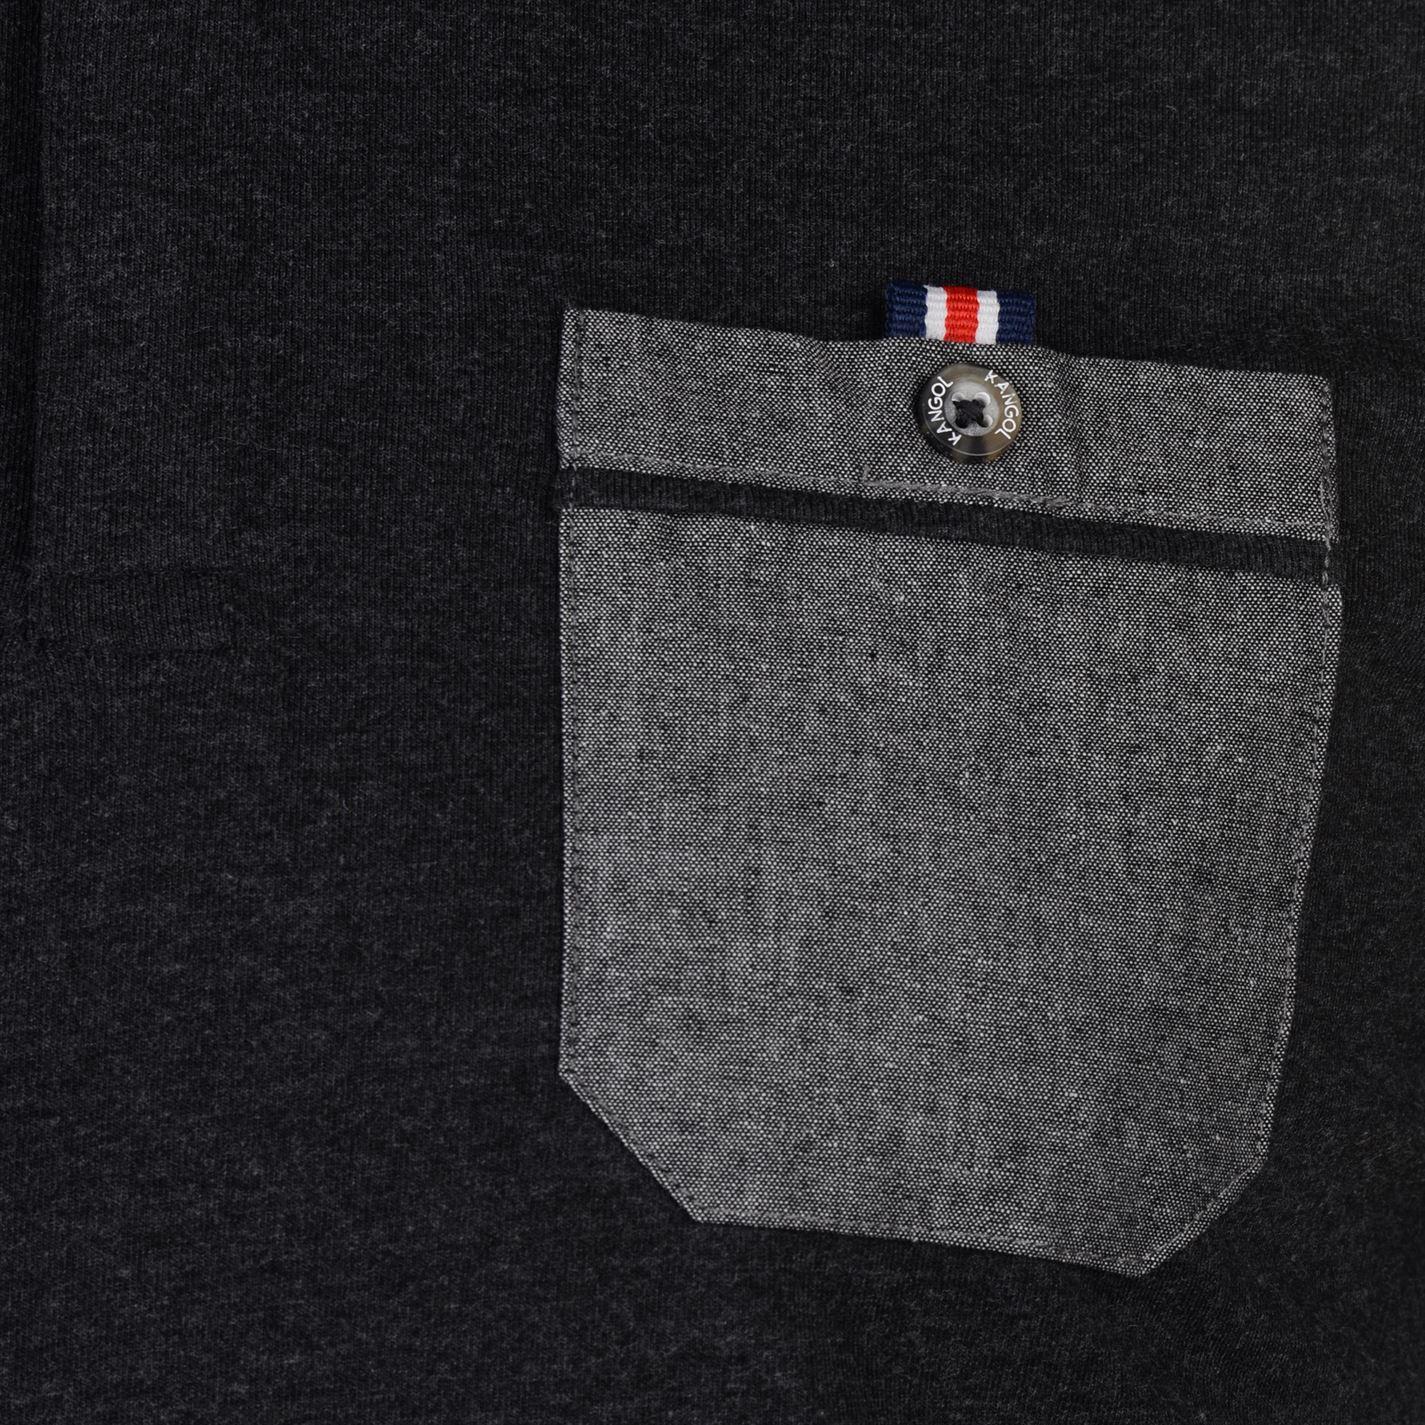 Kangol-Mens-Cham-Short-Sleeve-Polo-Shirt-Classic-Fit-Tee-Top-Lightweight-Colour thumbnail 14